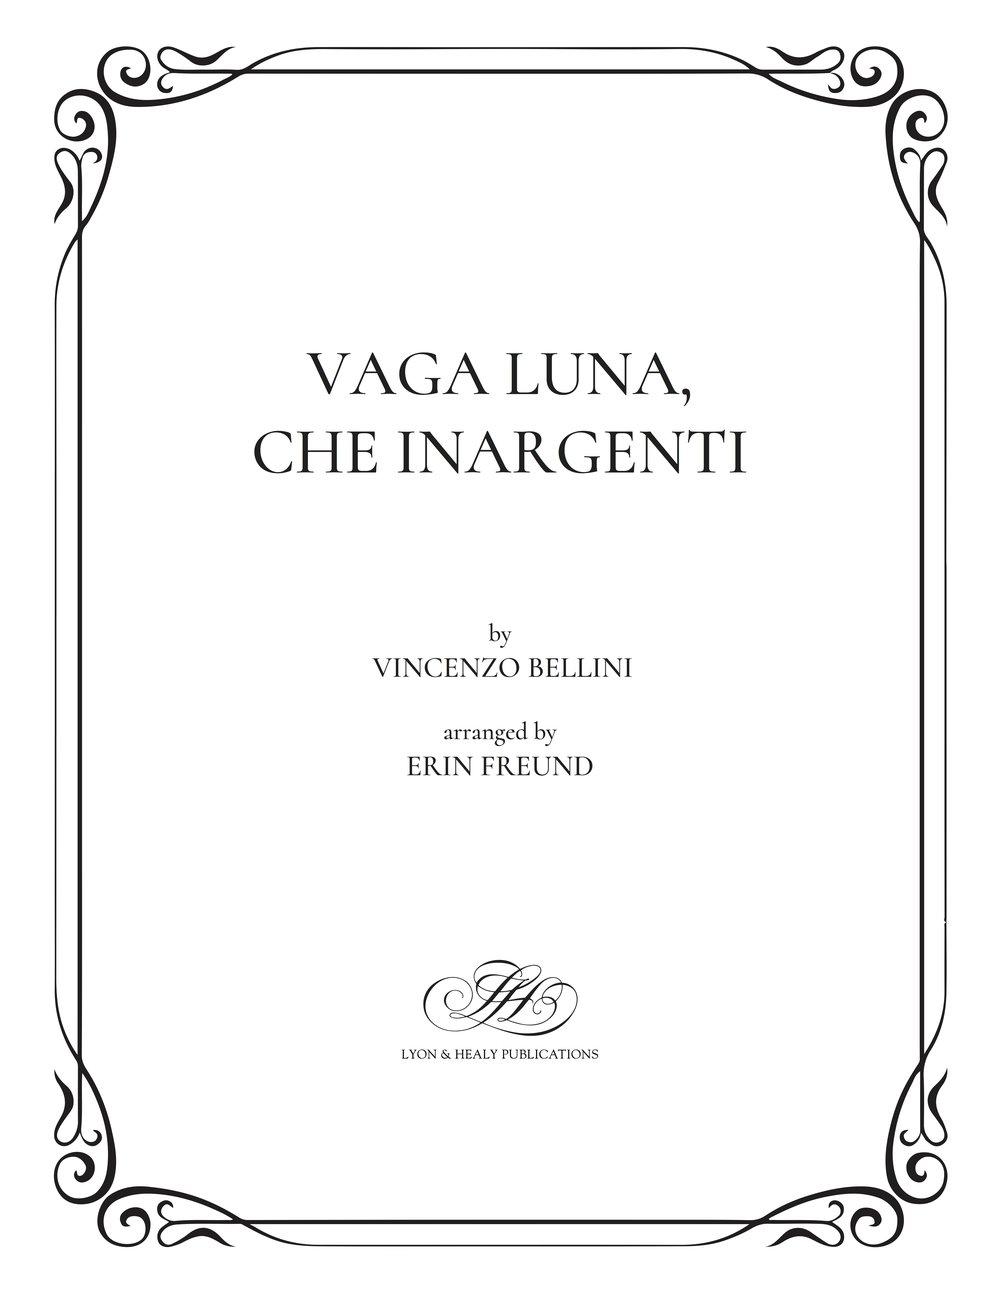 Vaga luna, che inargenti - Bellini-Freund cover.jpg